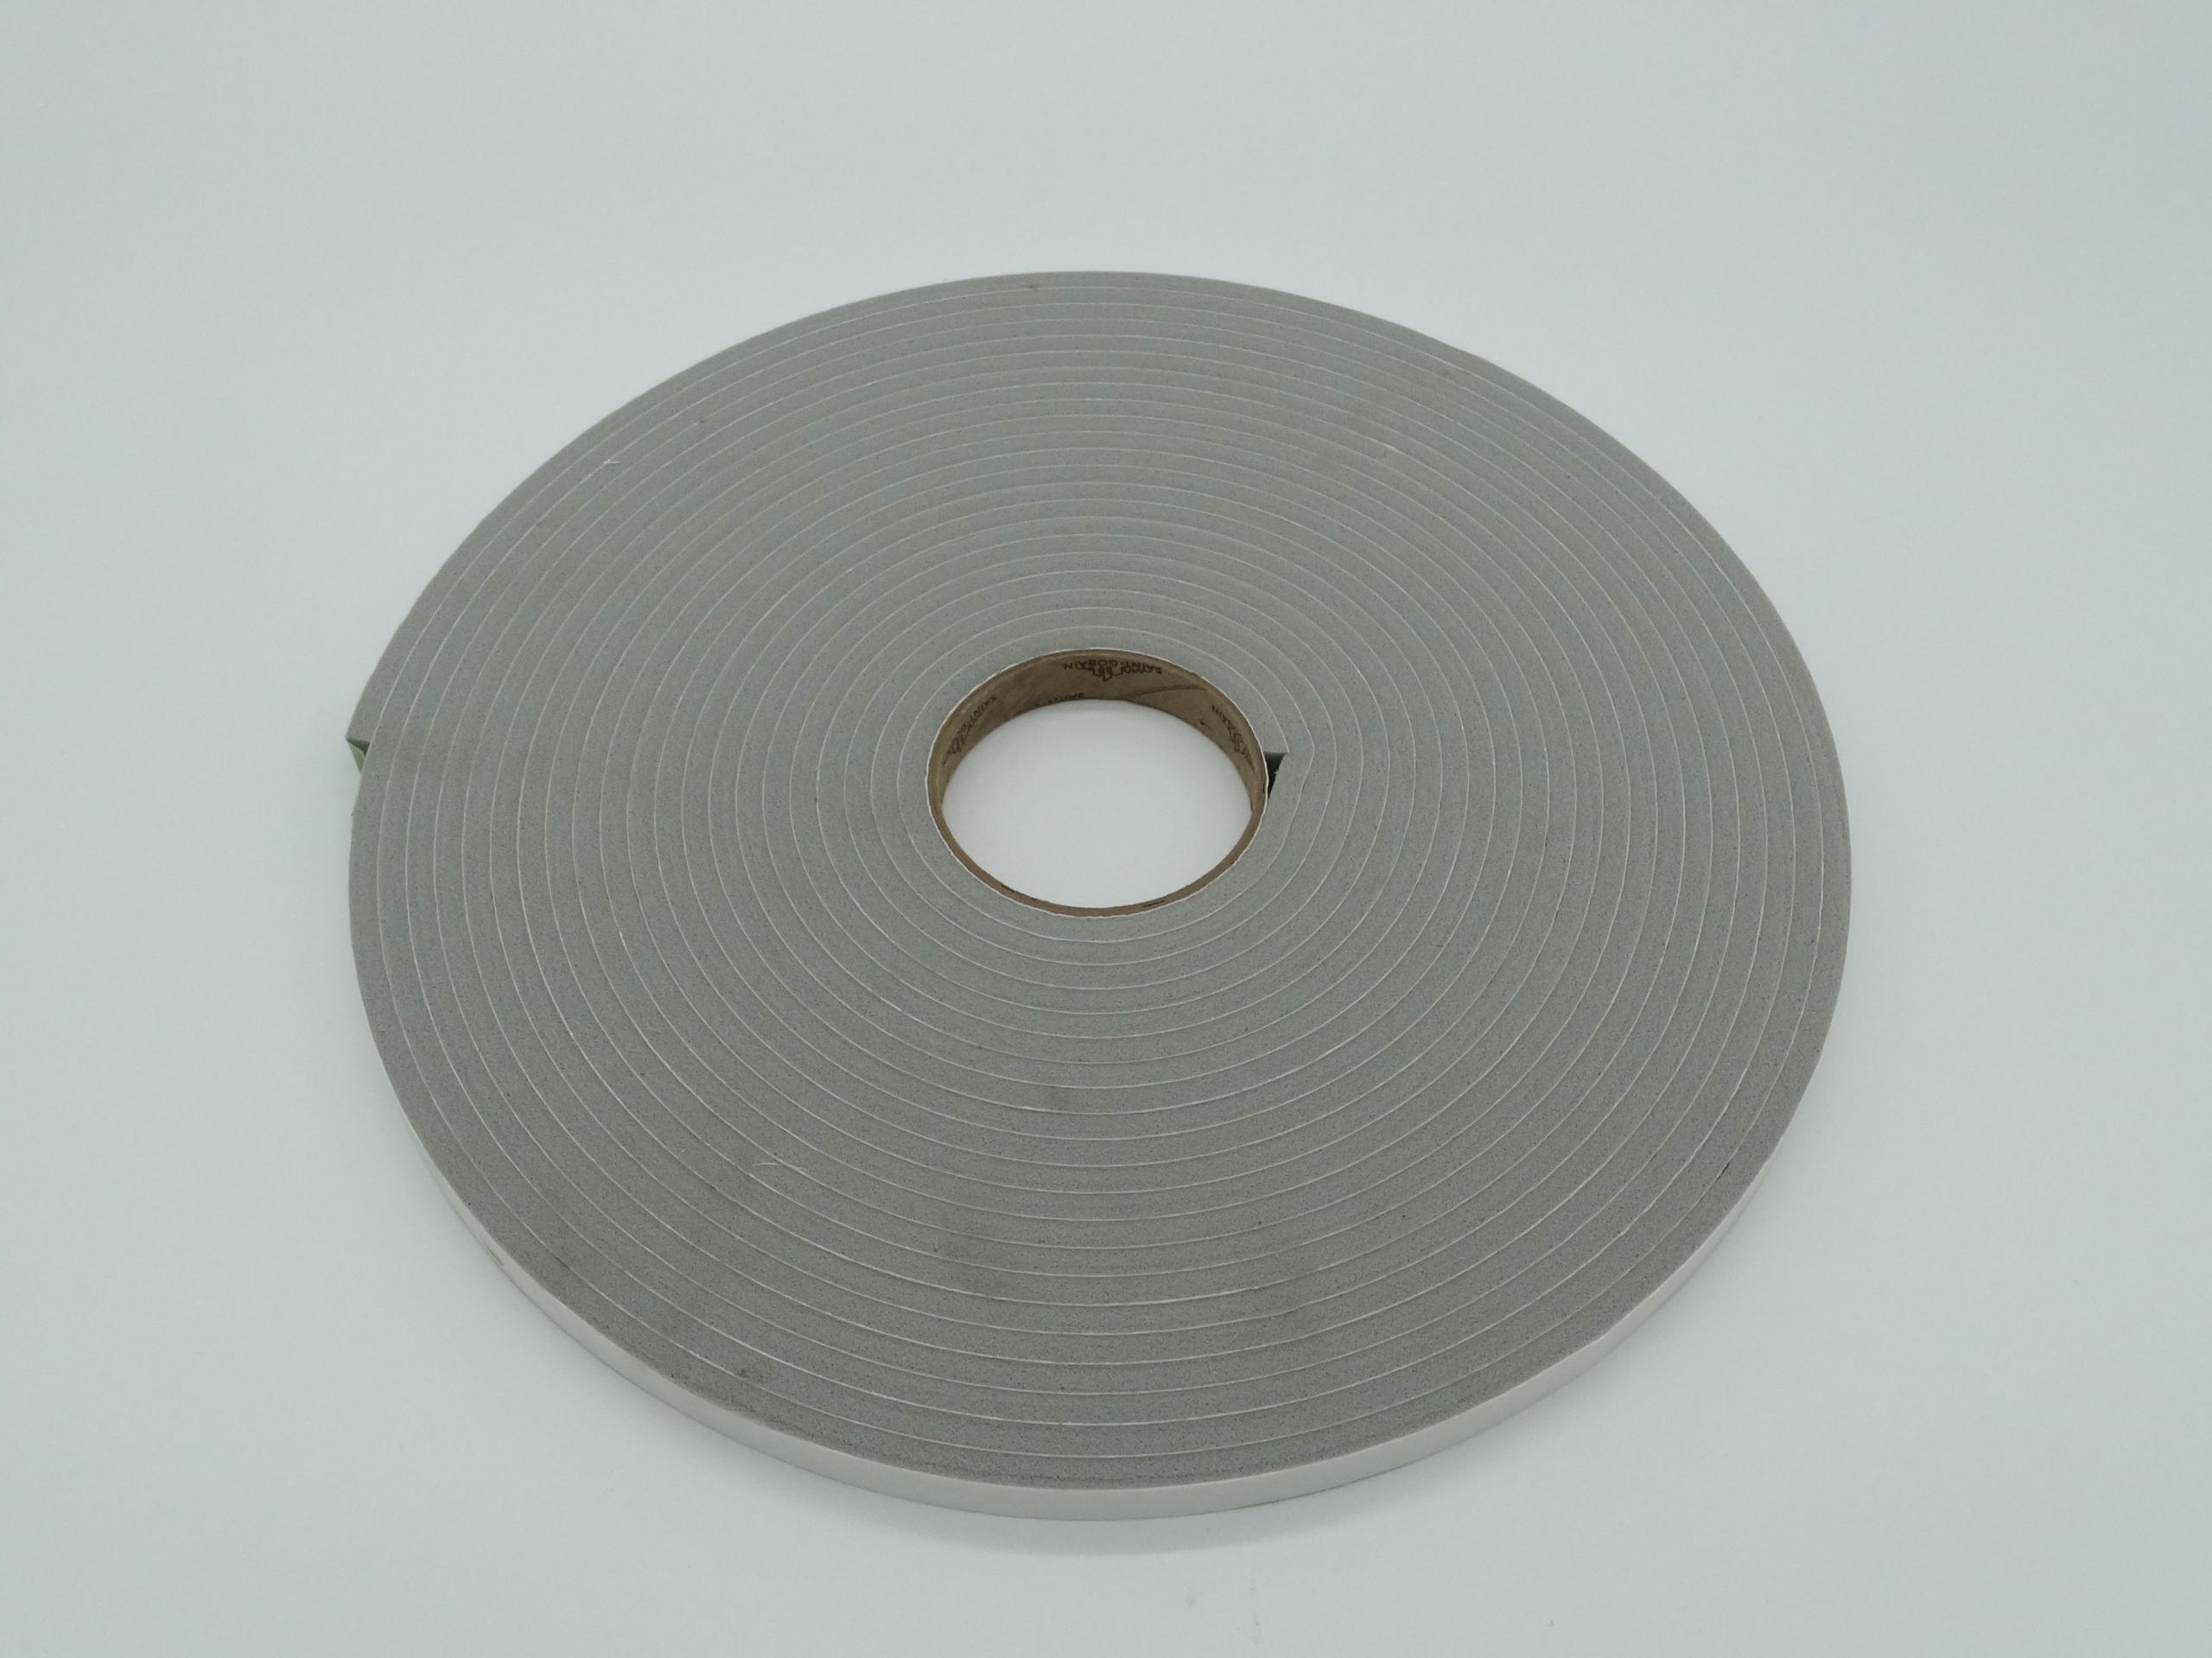 Sealing Tape: Foam sealing PVC, White – 15.2M